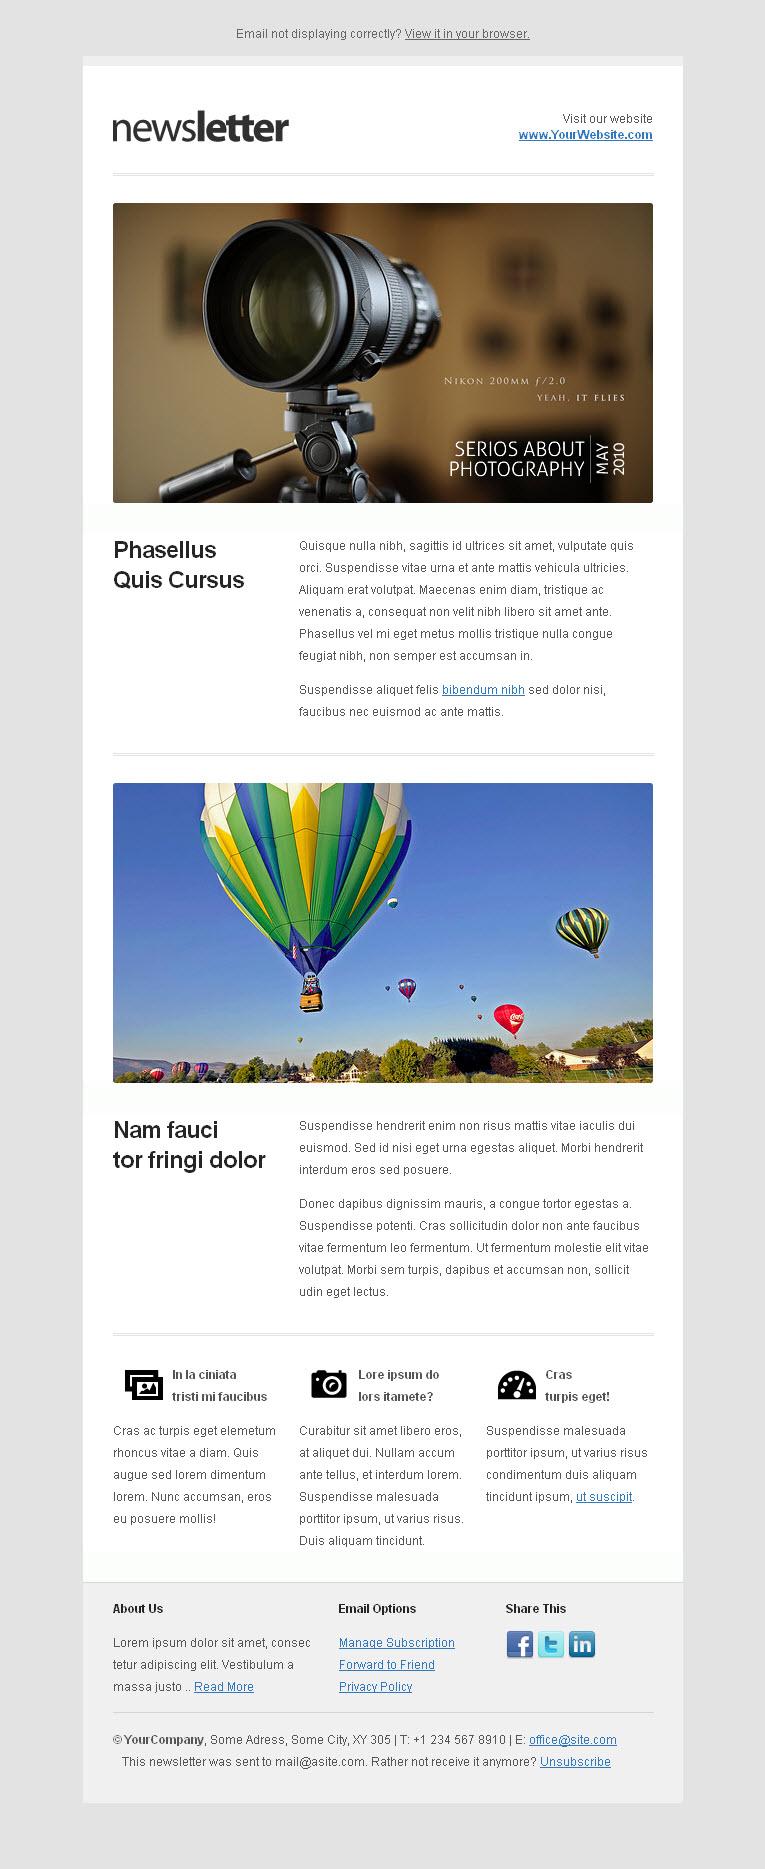 http://2.s3.envato.com/files/1492996/2_versatile-v3-template.jpg